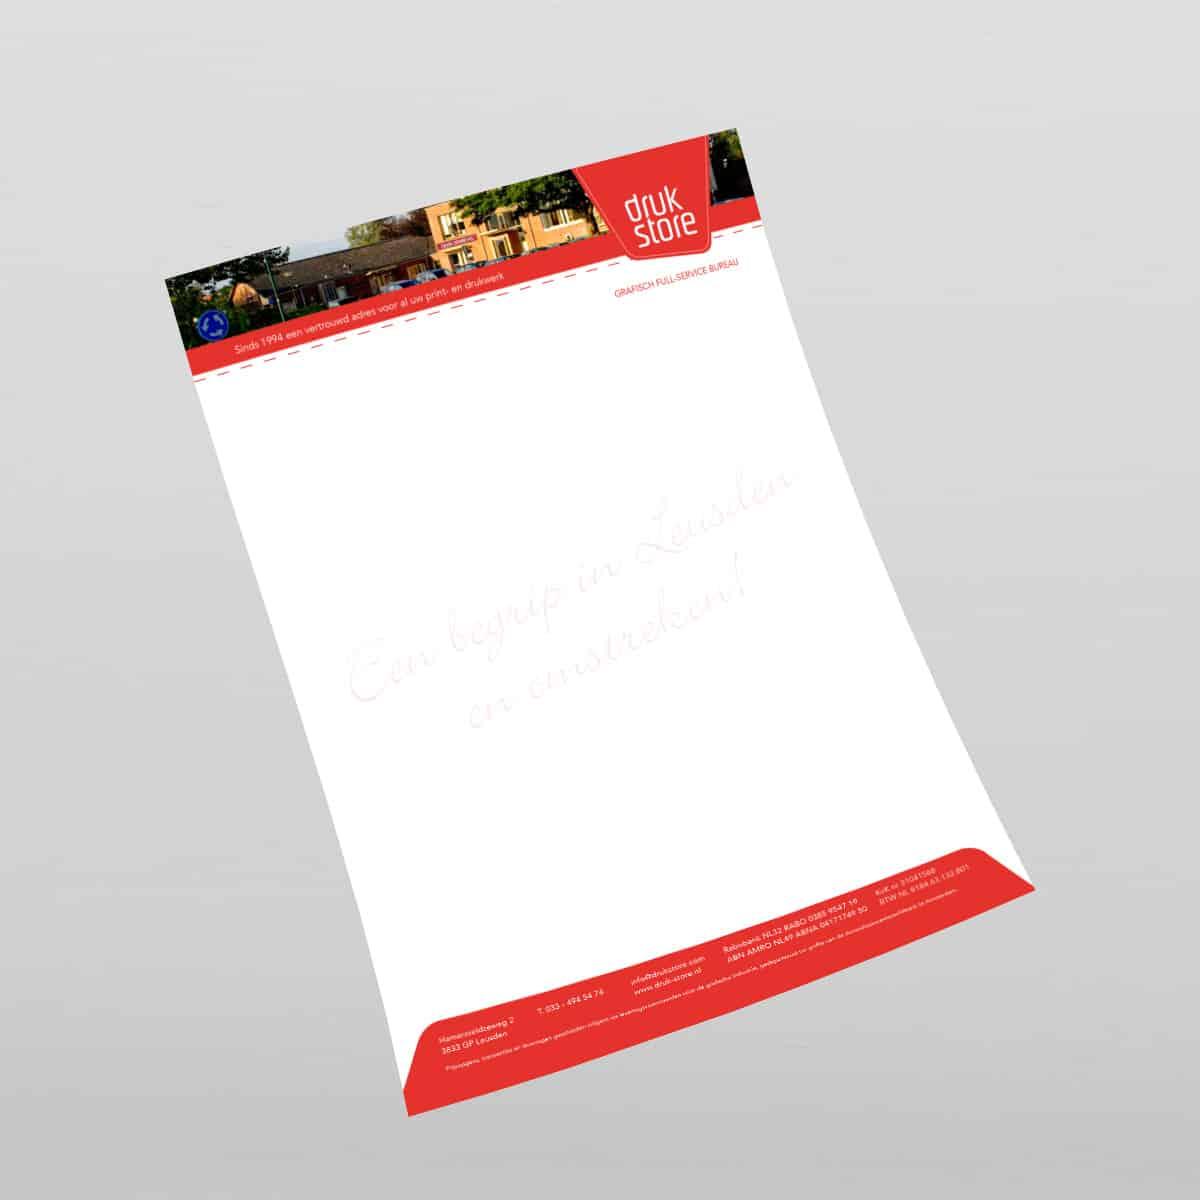 Briefpapier van druk-store